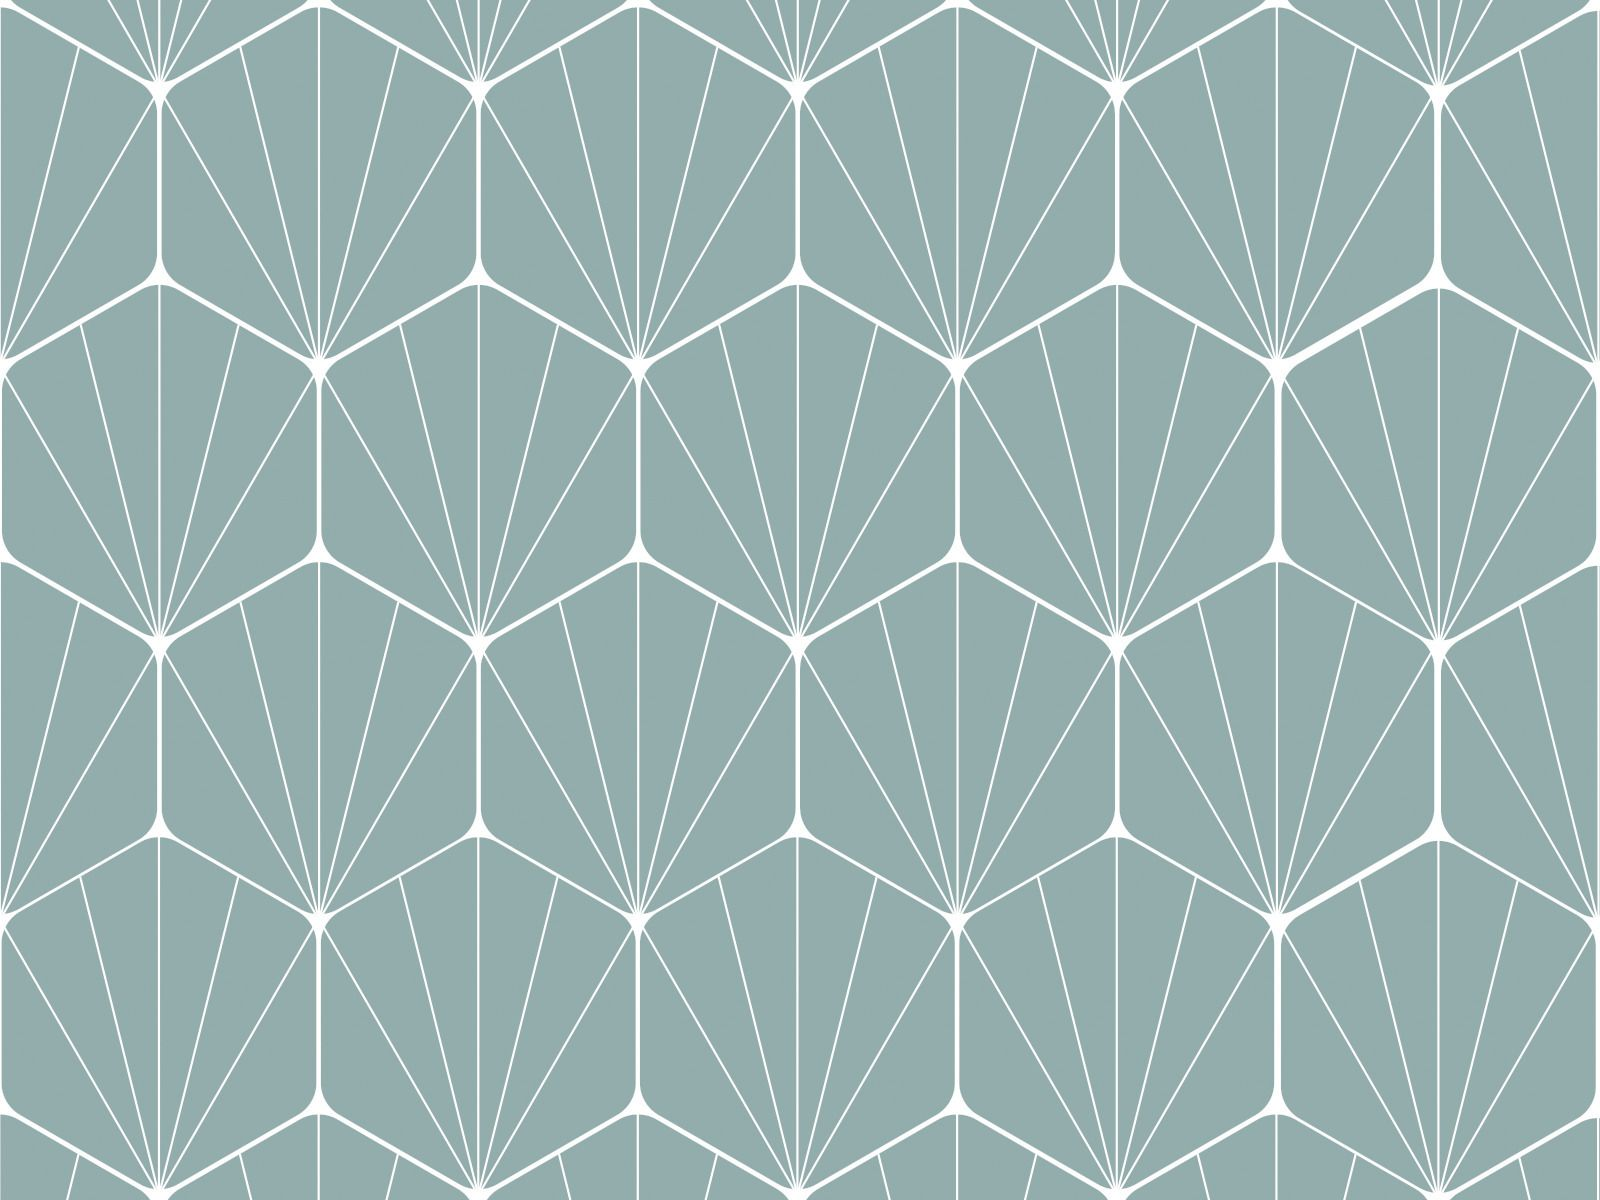 cr dence adh sive imperm abilis e constellation vert. Black Bedroom Furniture Sets. Home Design Ideas